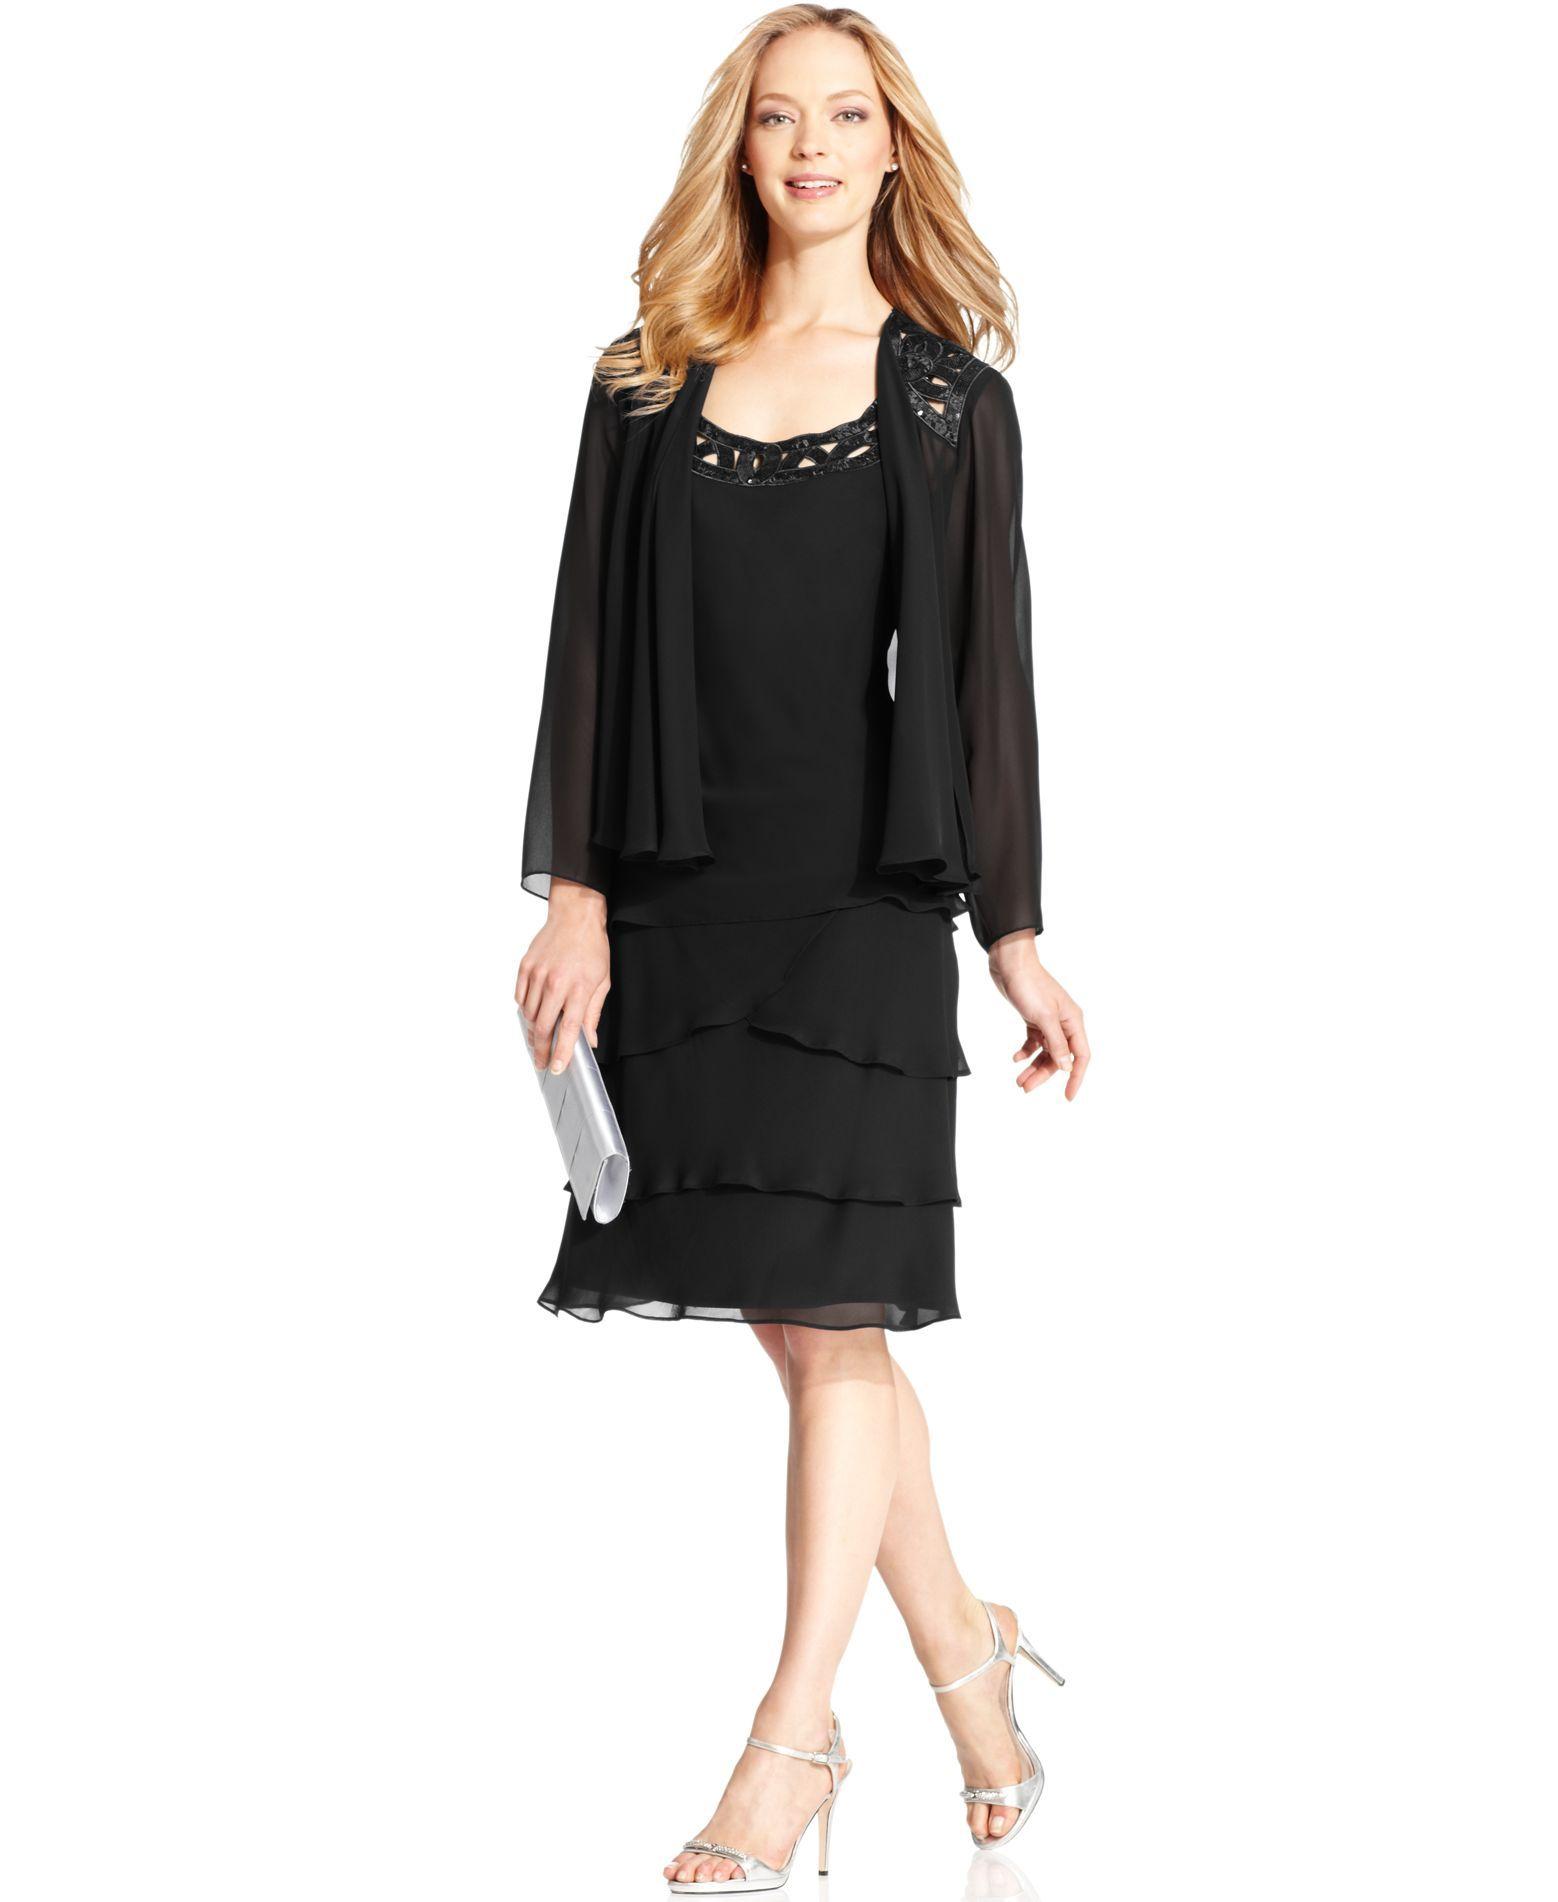 Sl sl fashion dresses - Sl Fashions Sleeveless Sequin Tiered Dress And Jacket